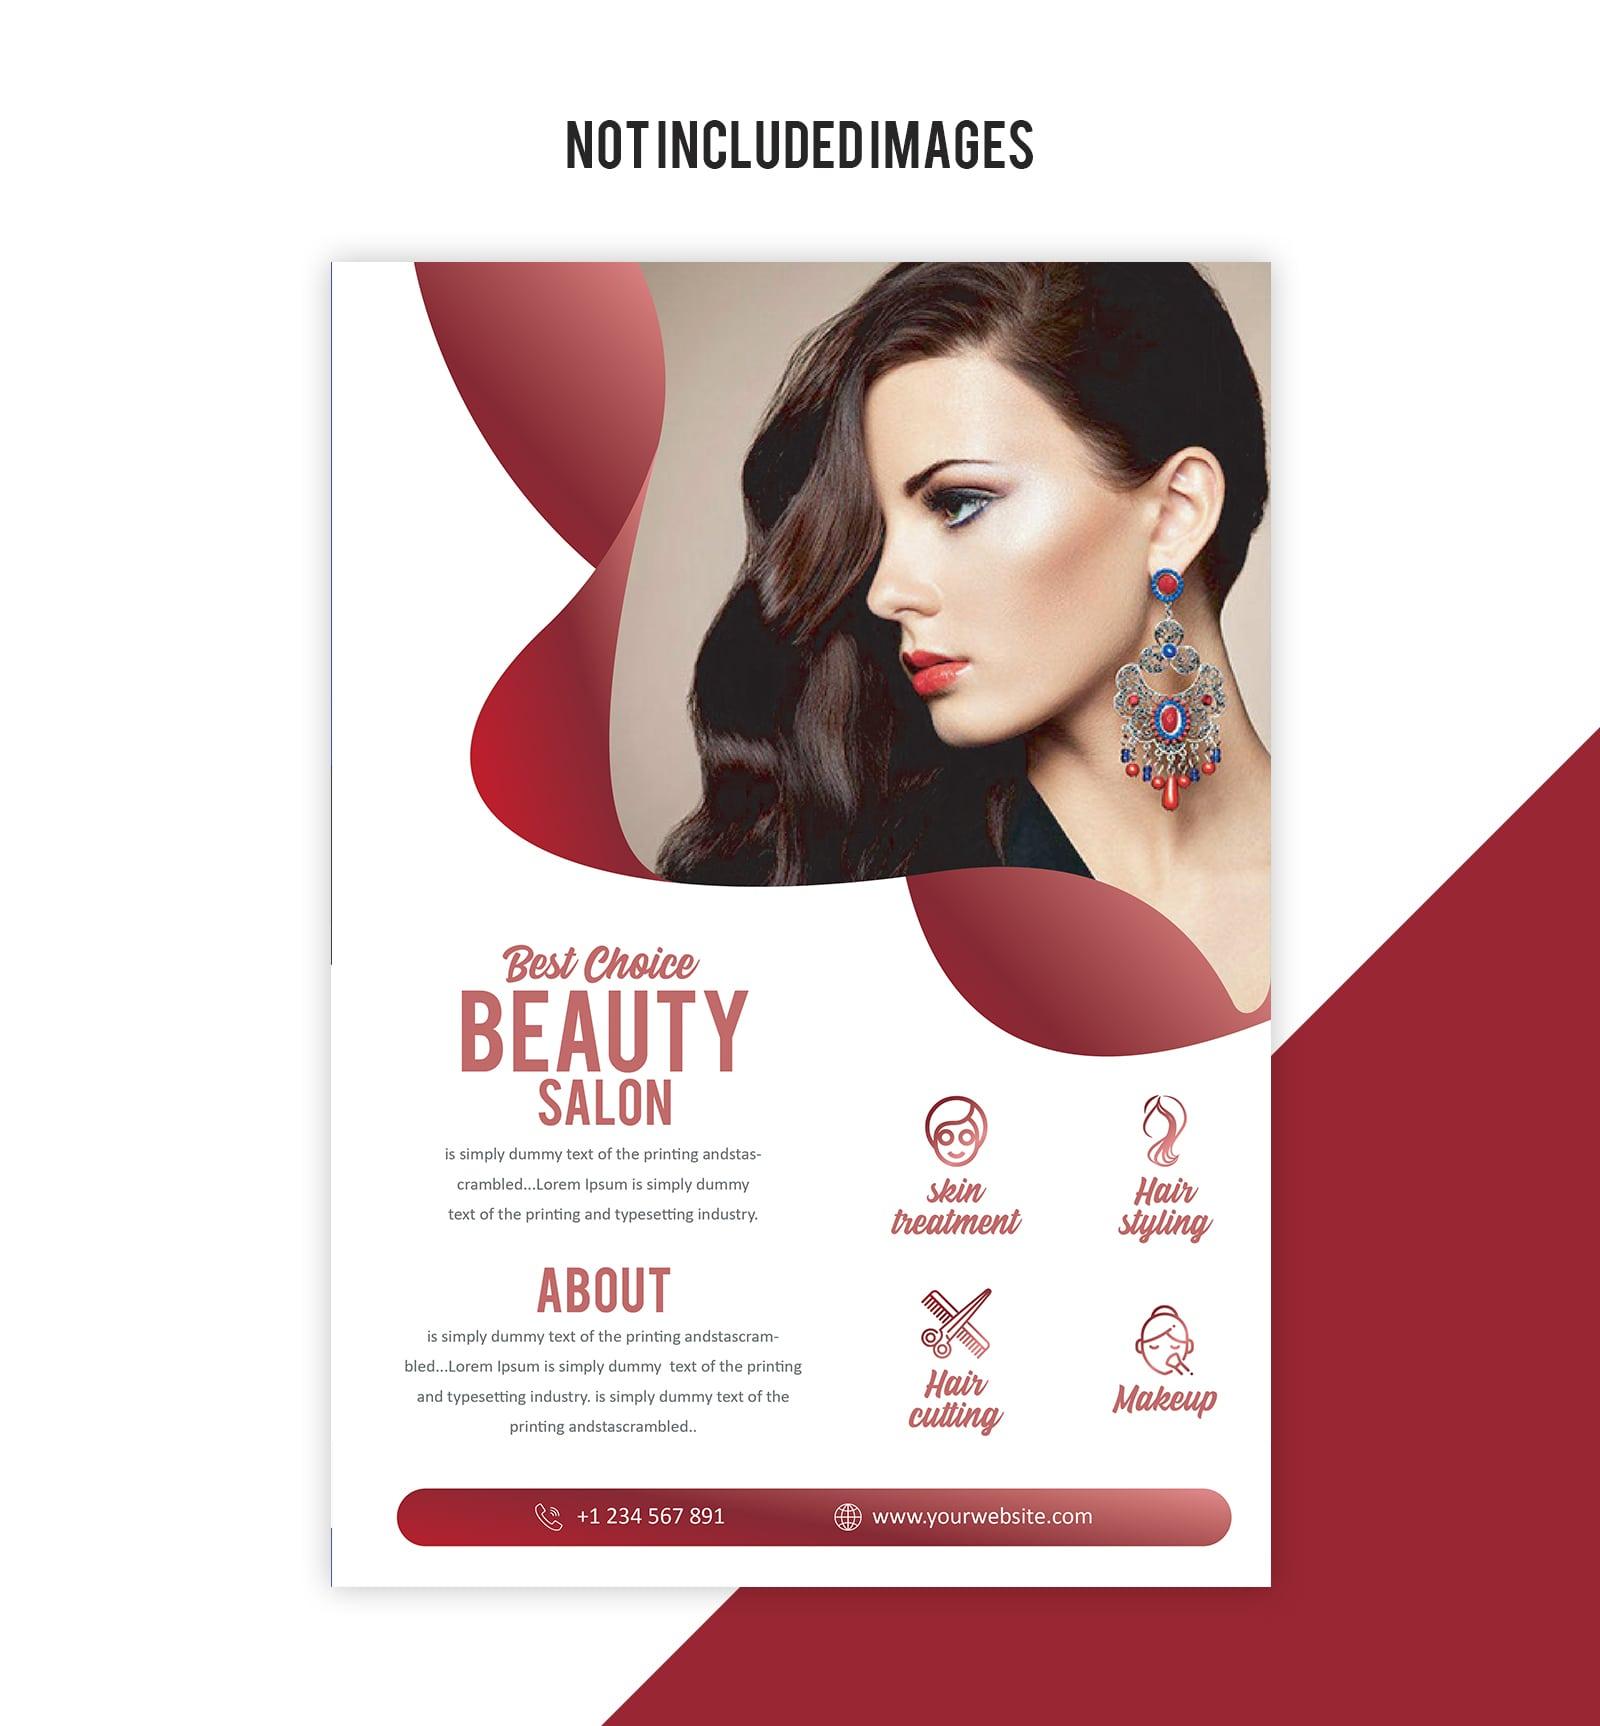 Salon Flyer Free Vector Art 134 Free Downloads